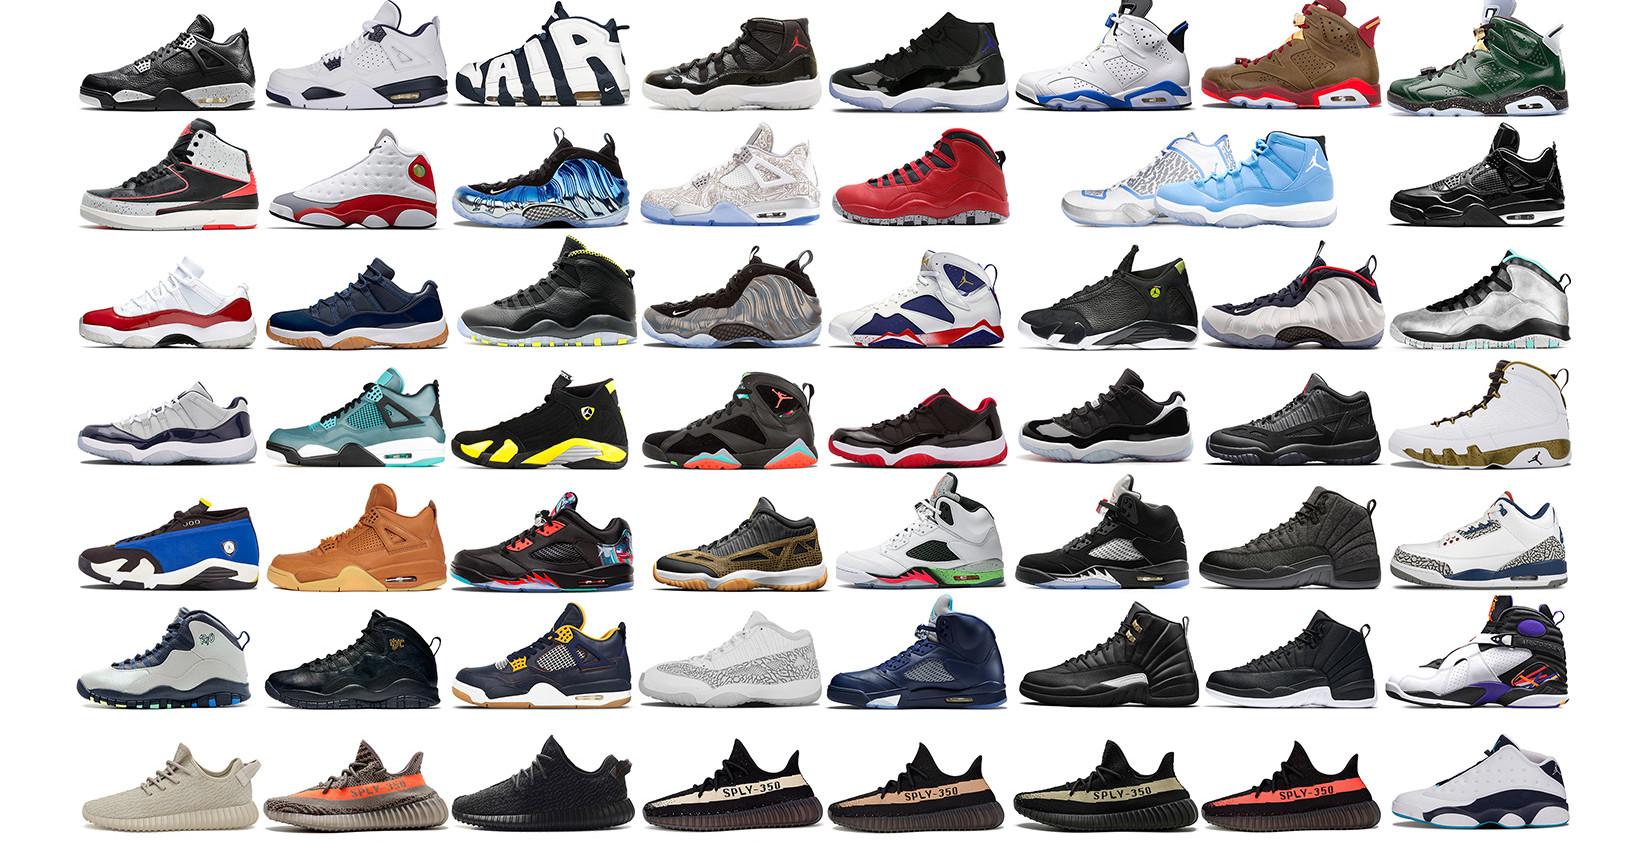 f685644ea6f72 Jimmy Jazz Harlem Jordan Yeezy Nike Restock